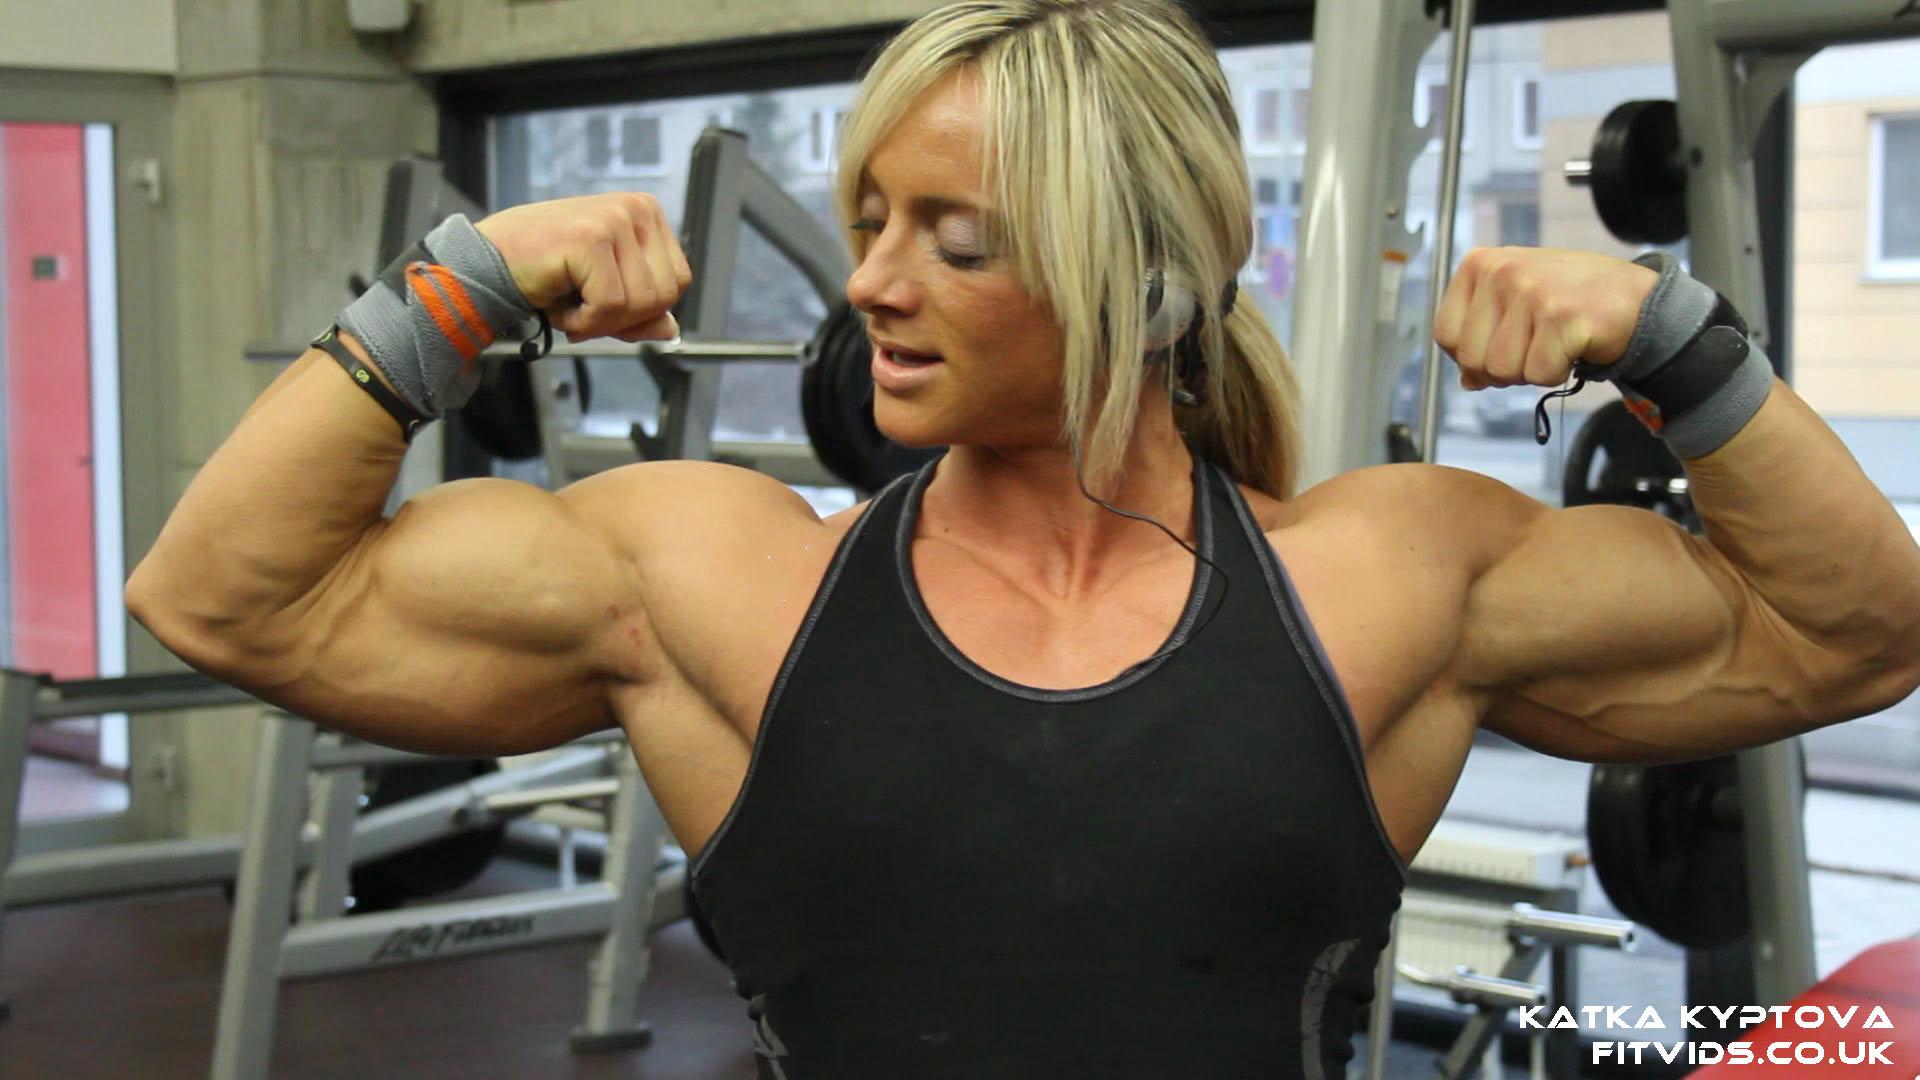 New Katka Kyptova Video! - Female Muscle